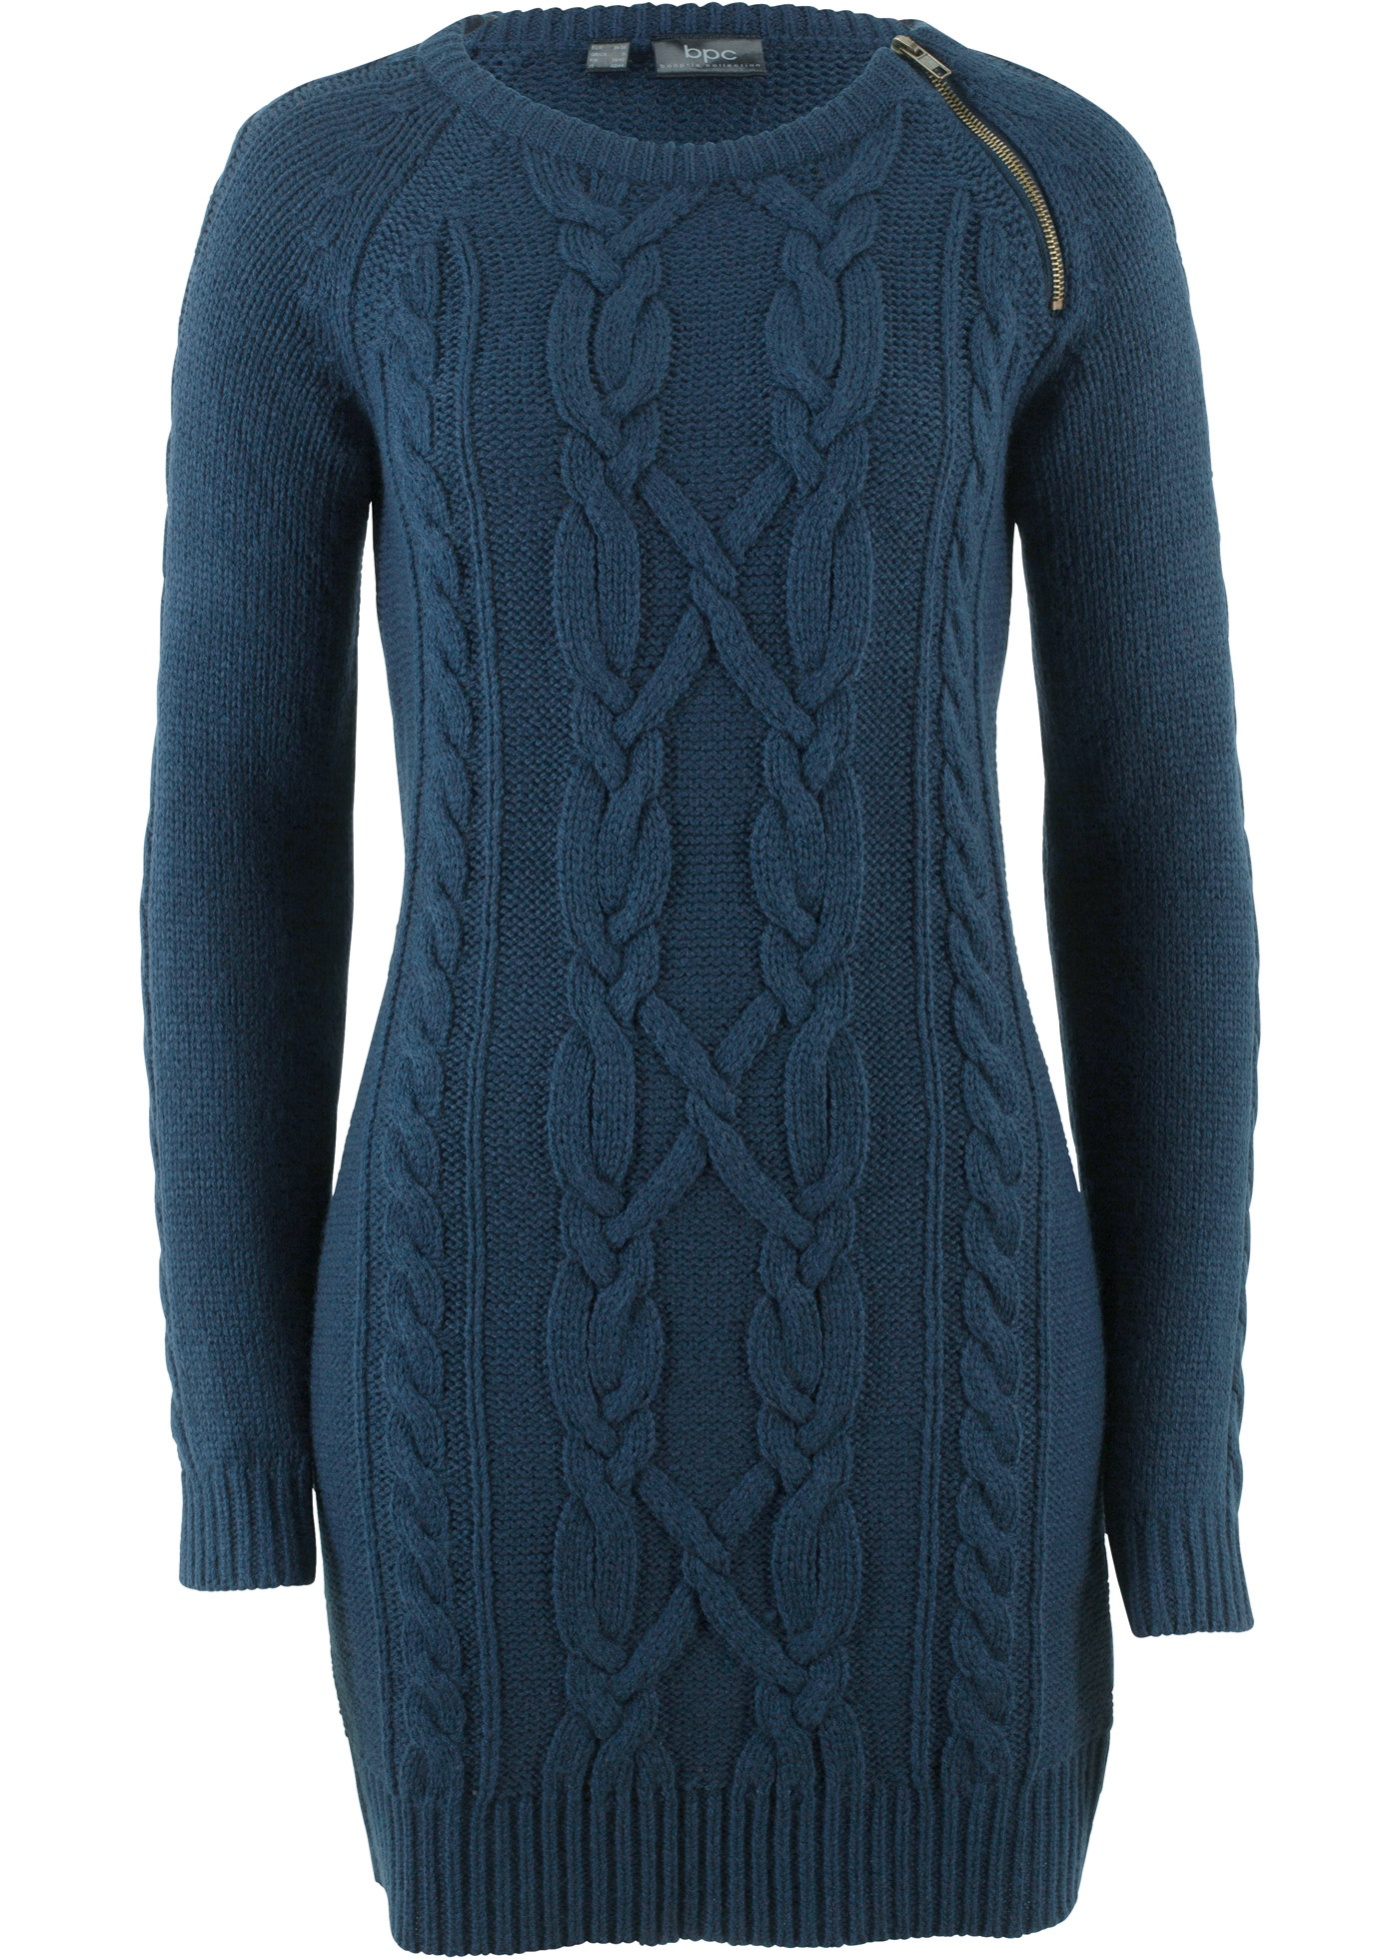 Pletené šaty - Modrá